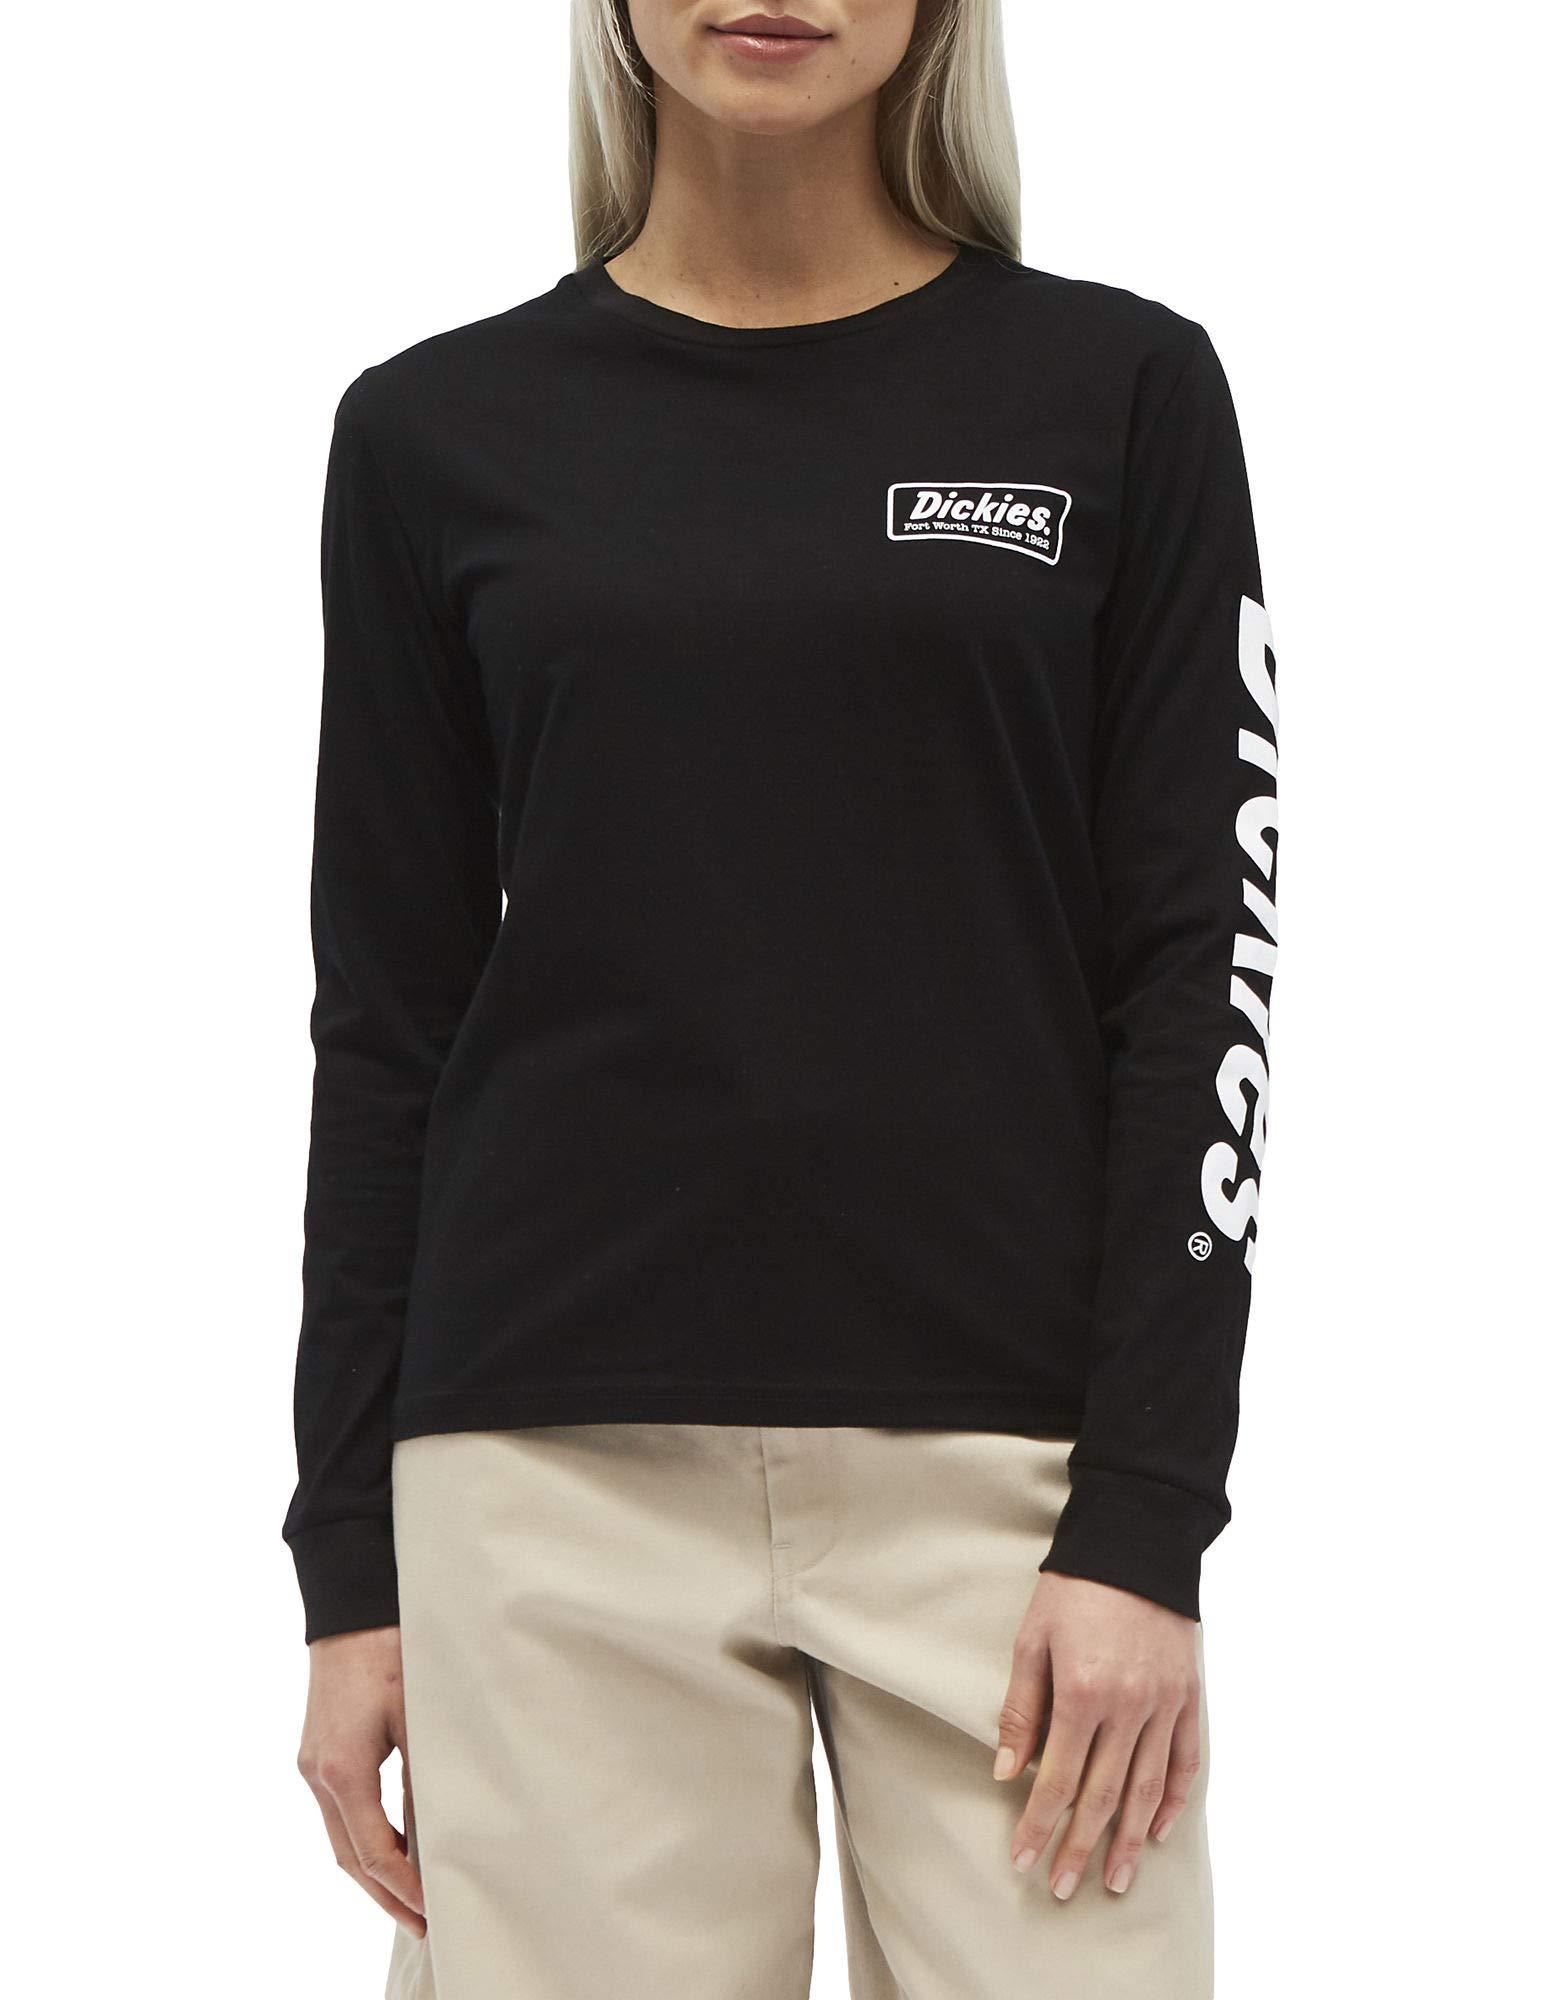 Dickies Girl Juniors' Logo Long Sleeve T-Shirt (Black/White, Small)